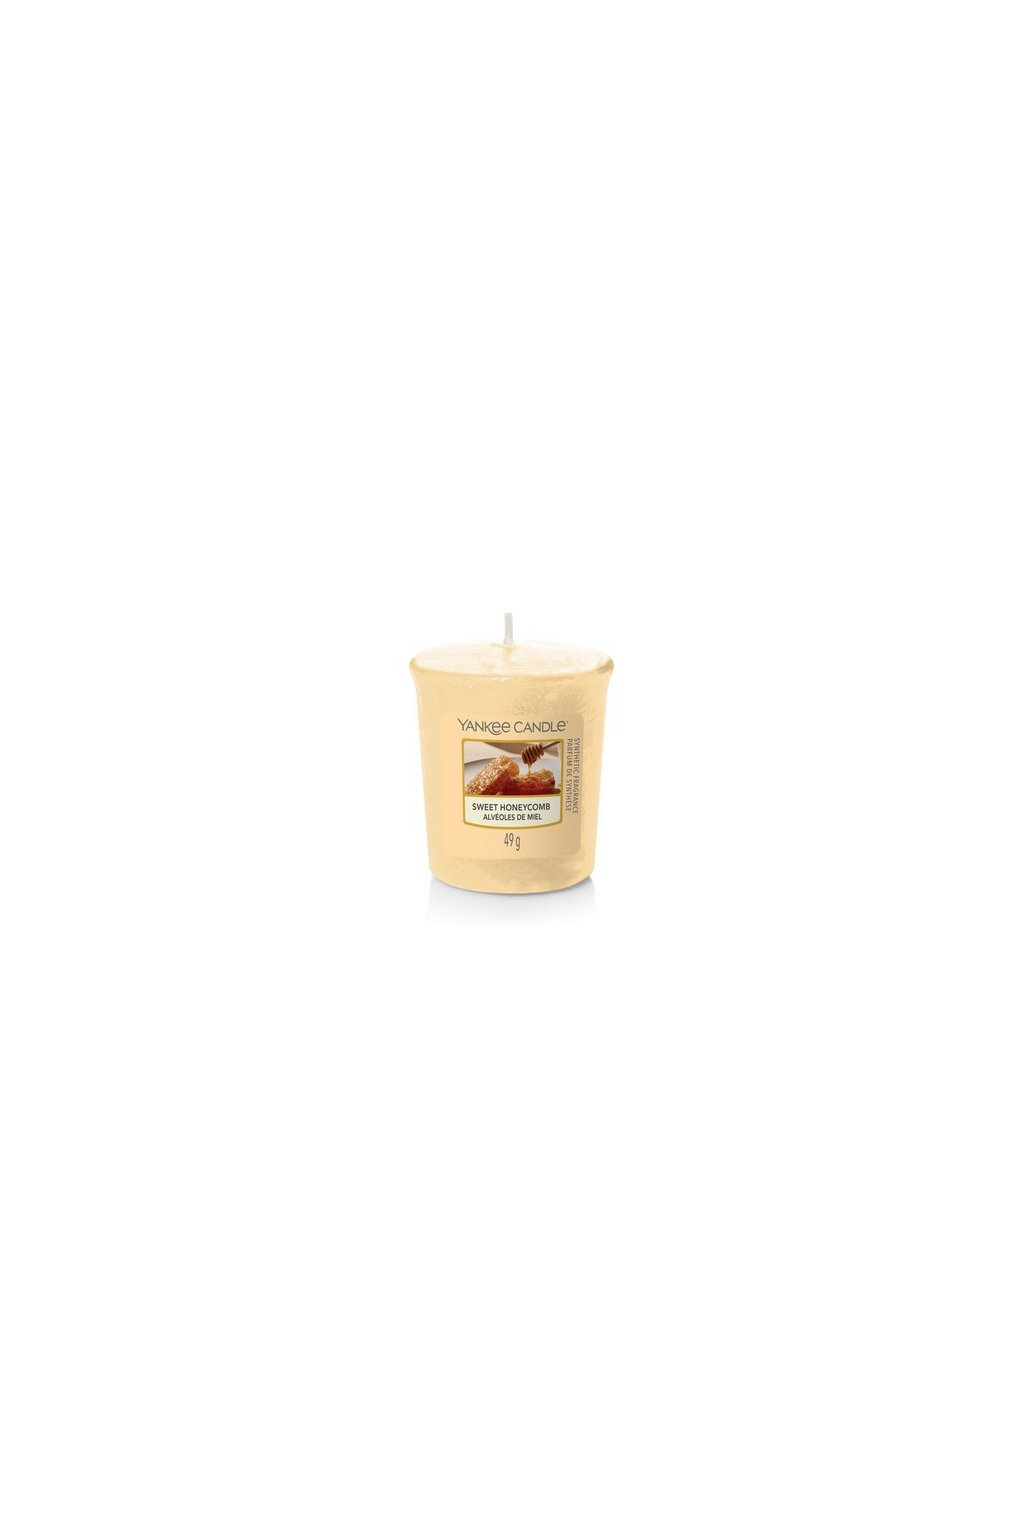 Yankee Candle Sweet Honeycomb 49g